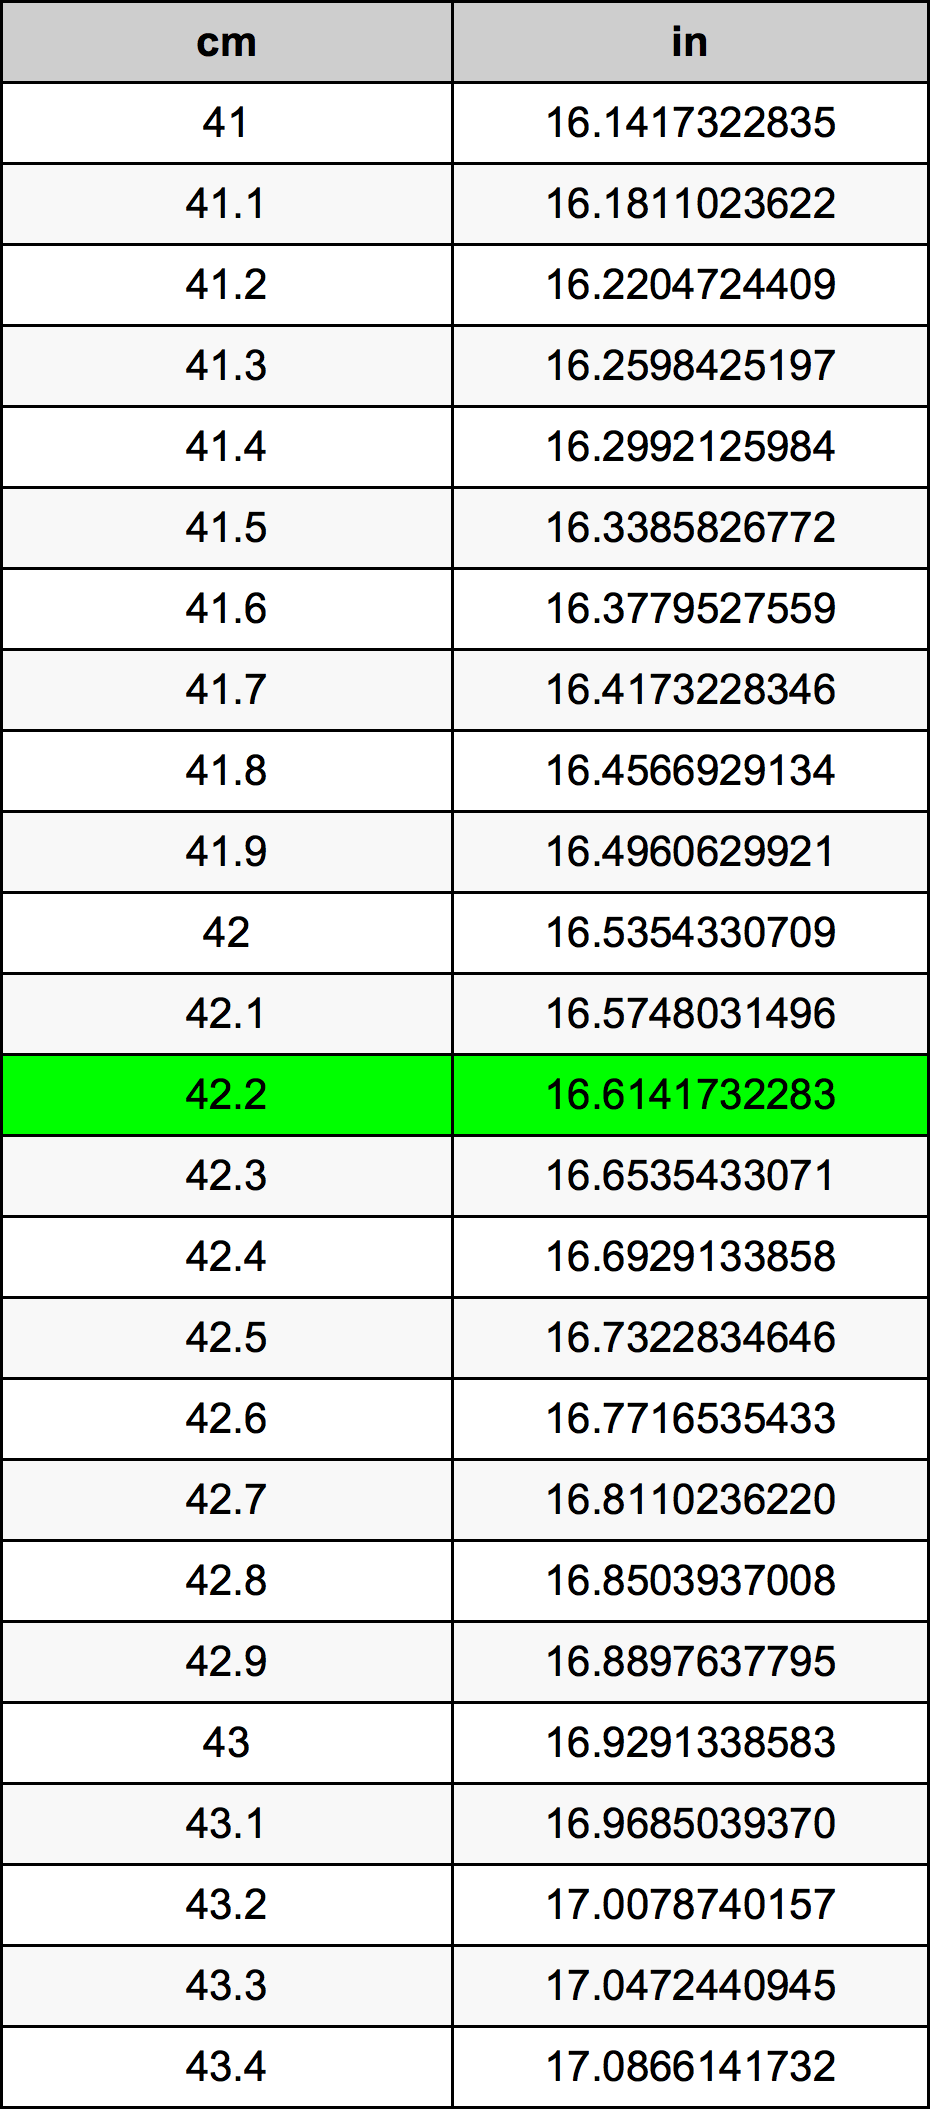 42.2 Centímetro Tabla de conversión